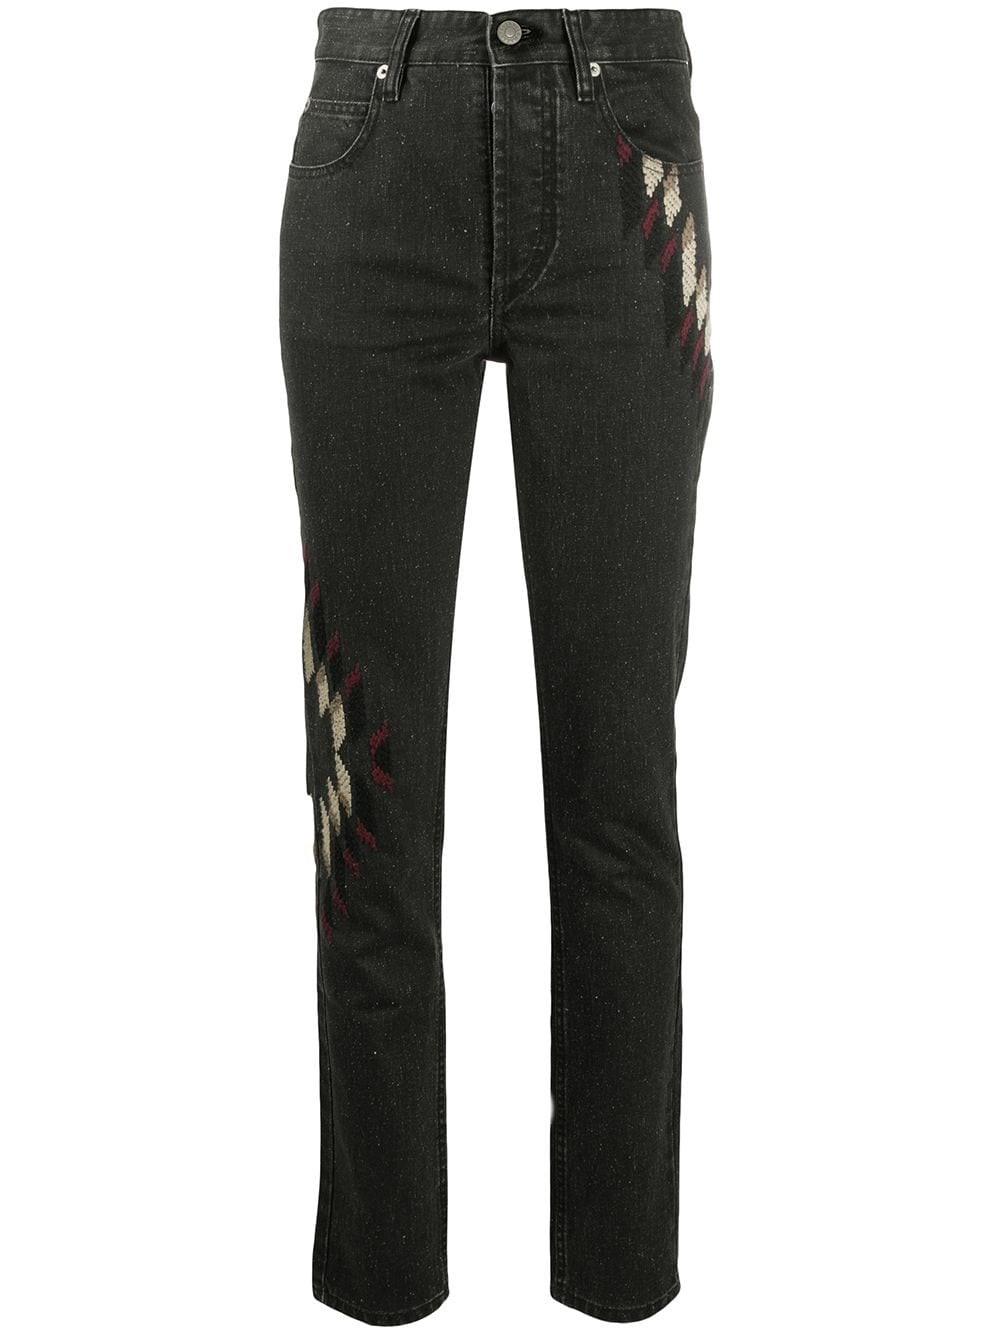 "ISABEL MARANT ETOILE ""Bilianab"" Embroidered Jeans"